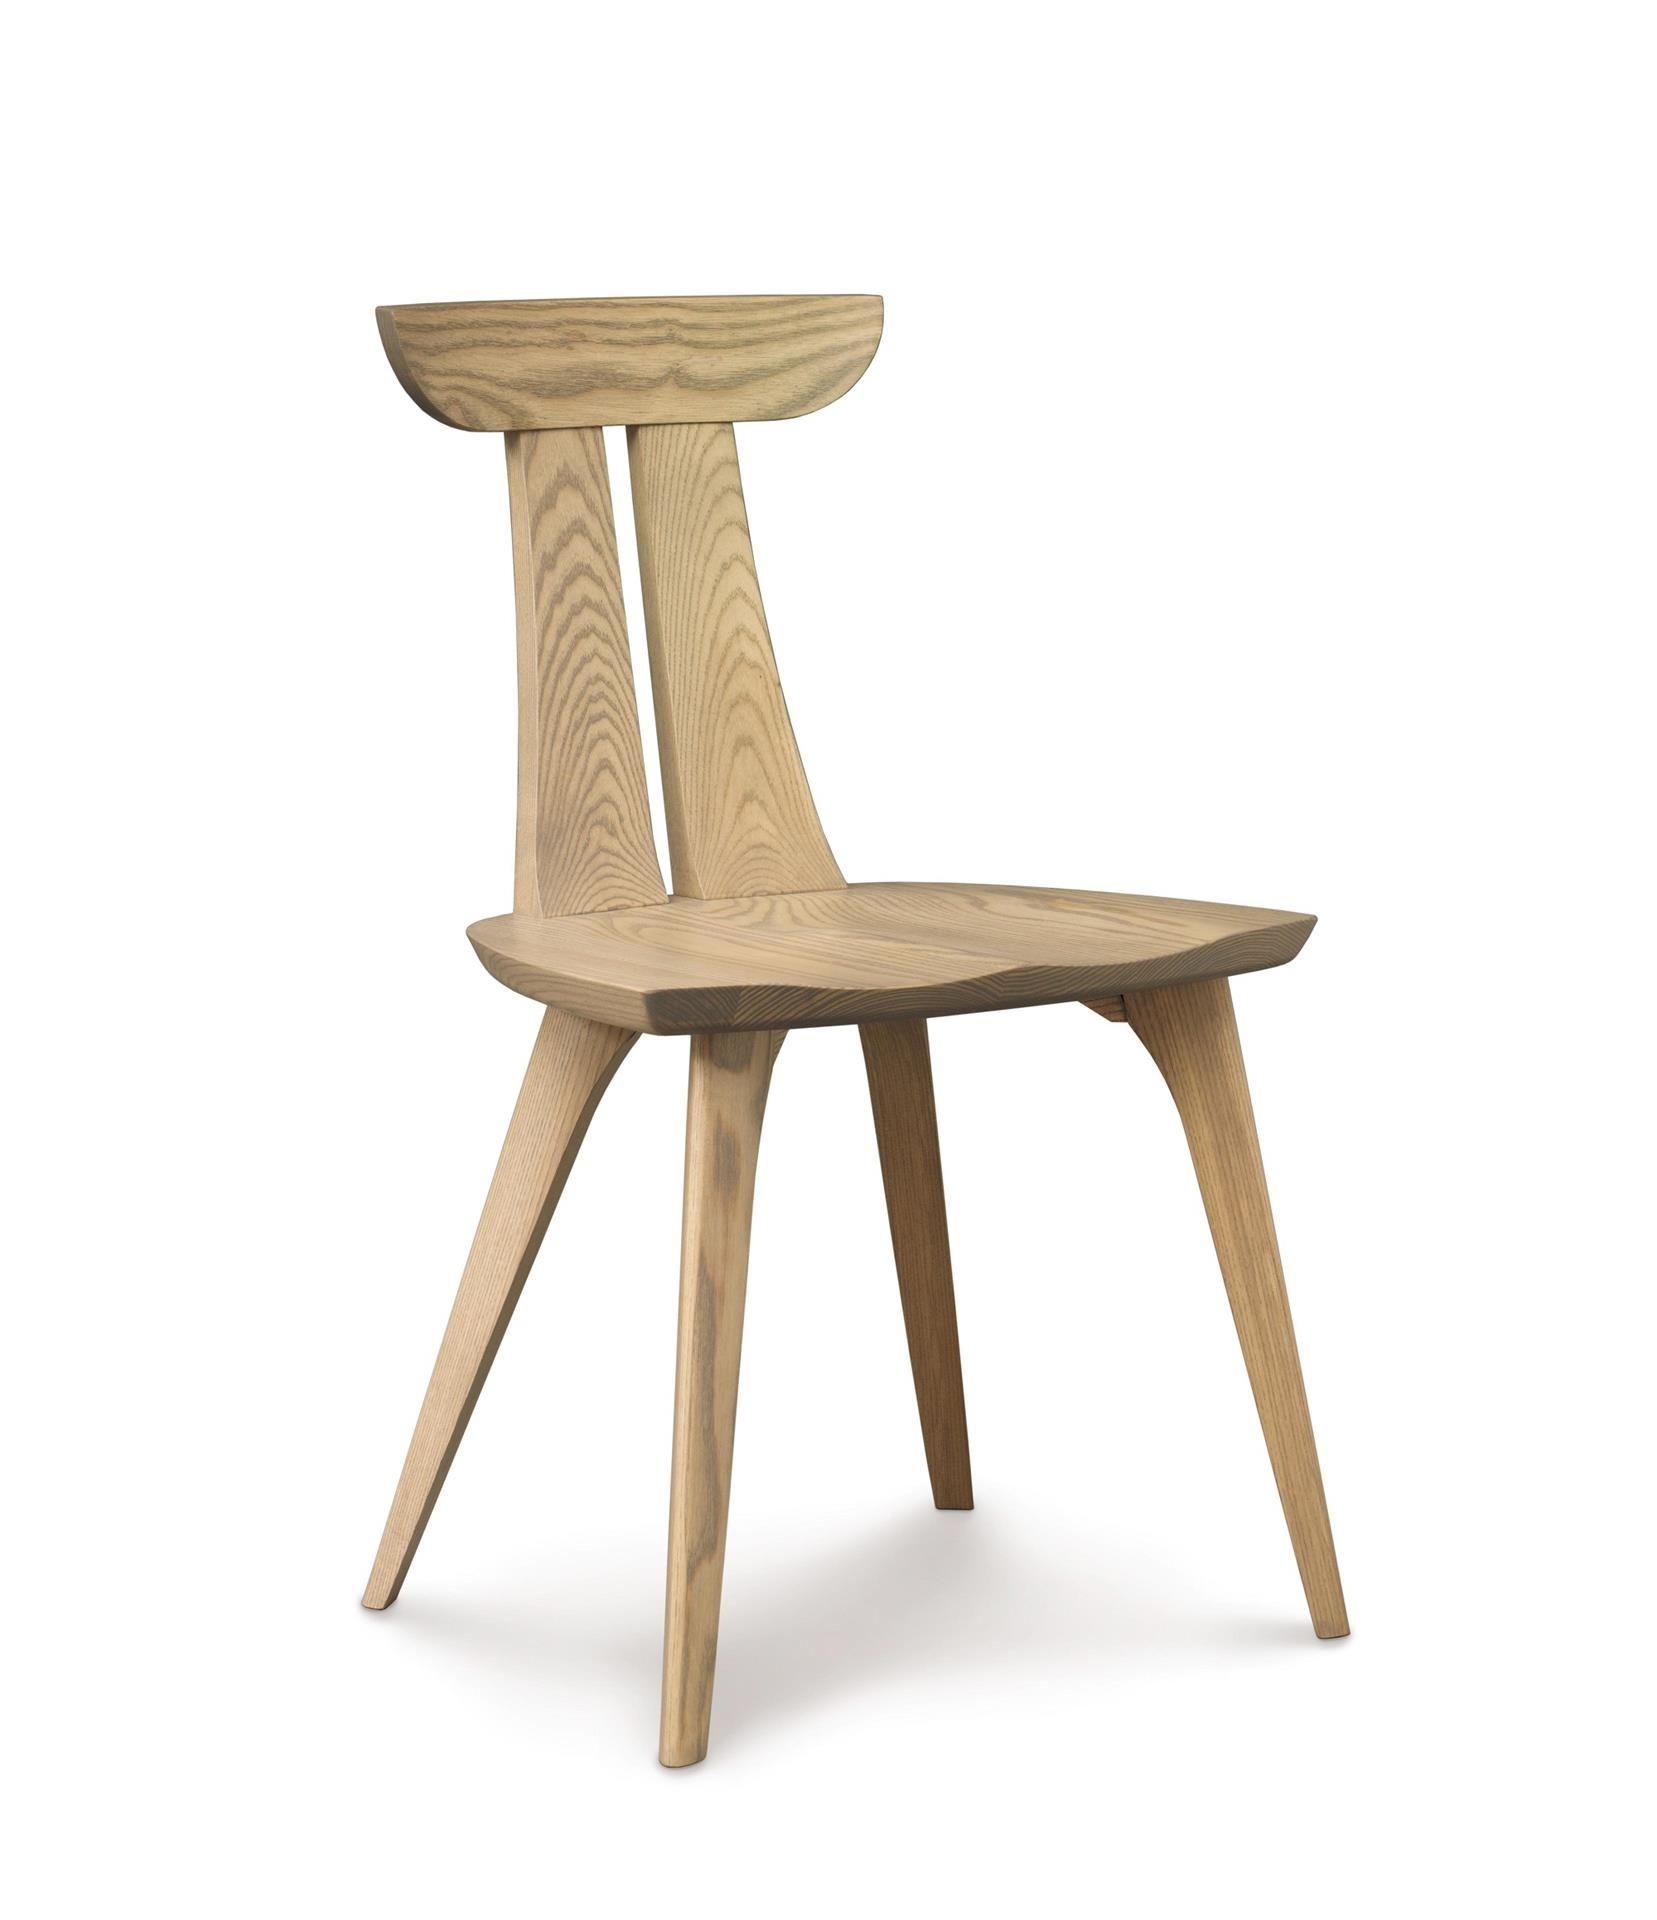 Timeless modern furniture design by copeland furniture estelle dining chair